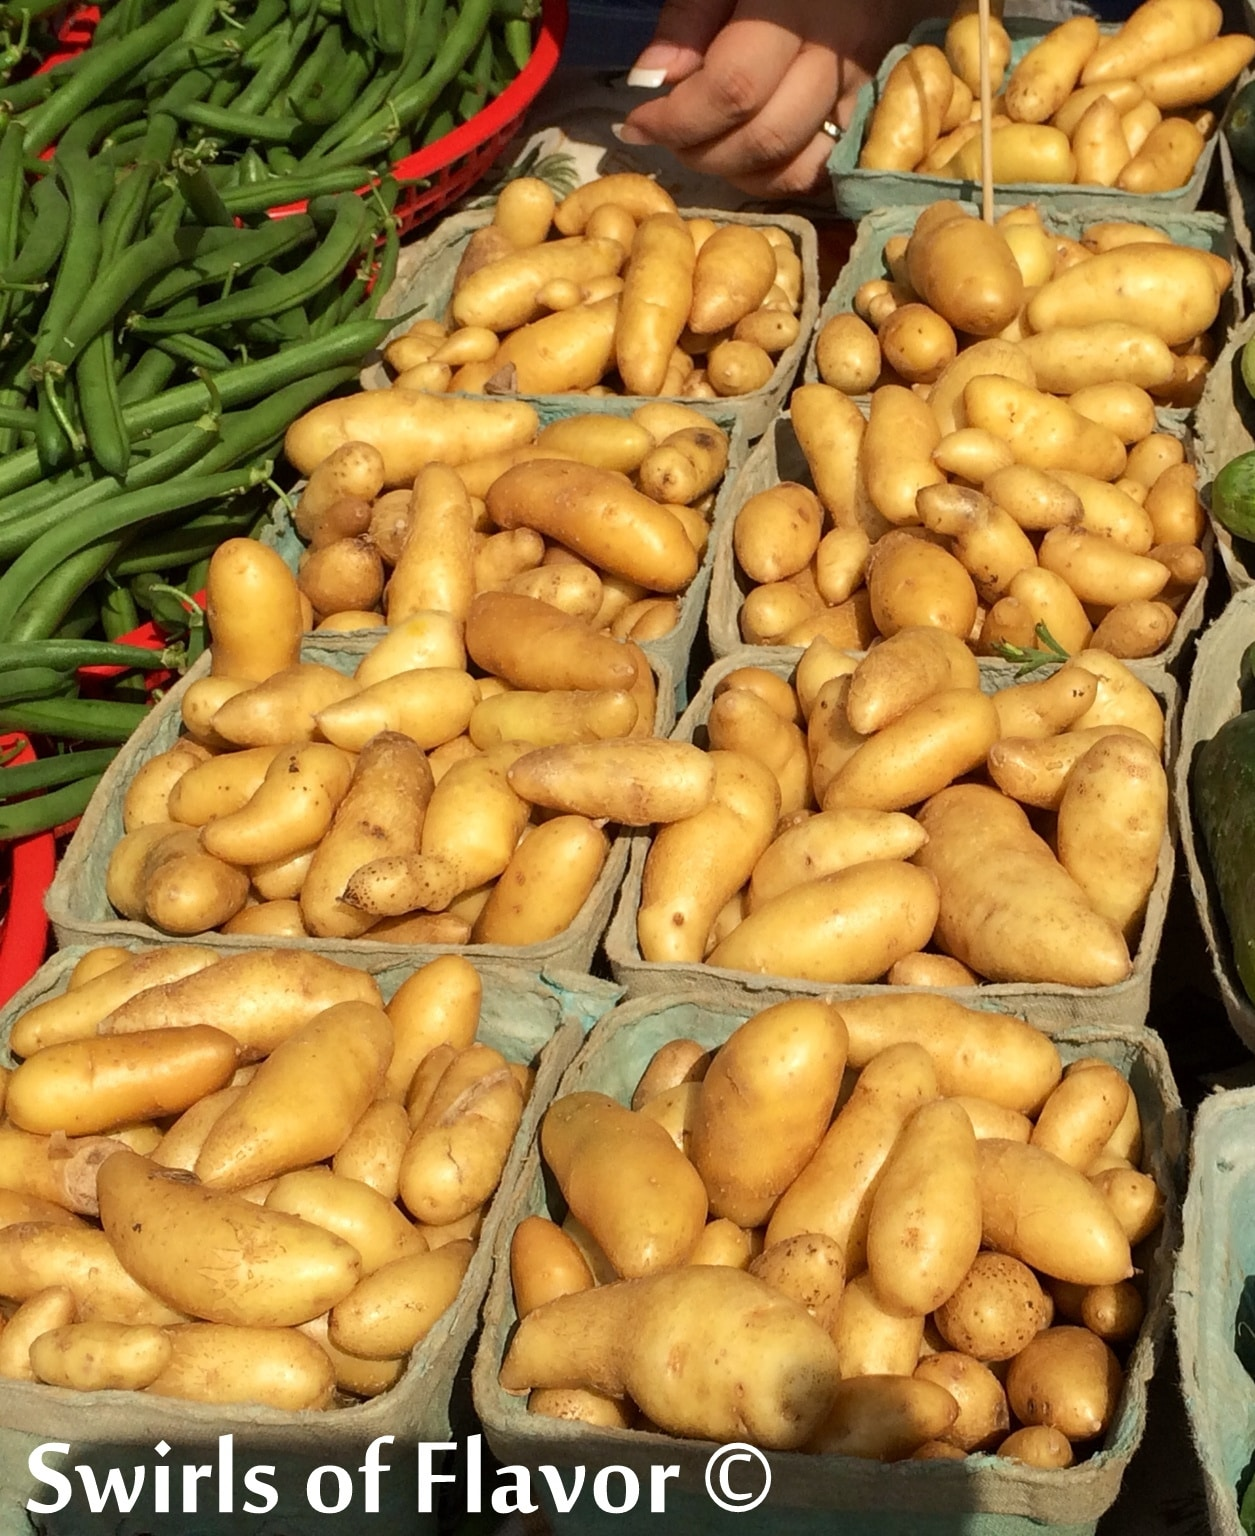 potatoes at the farmers market